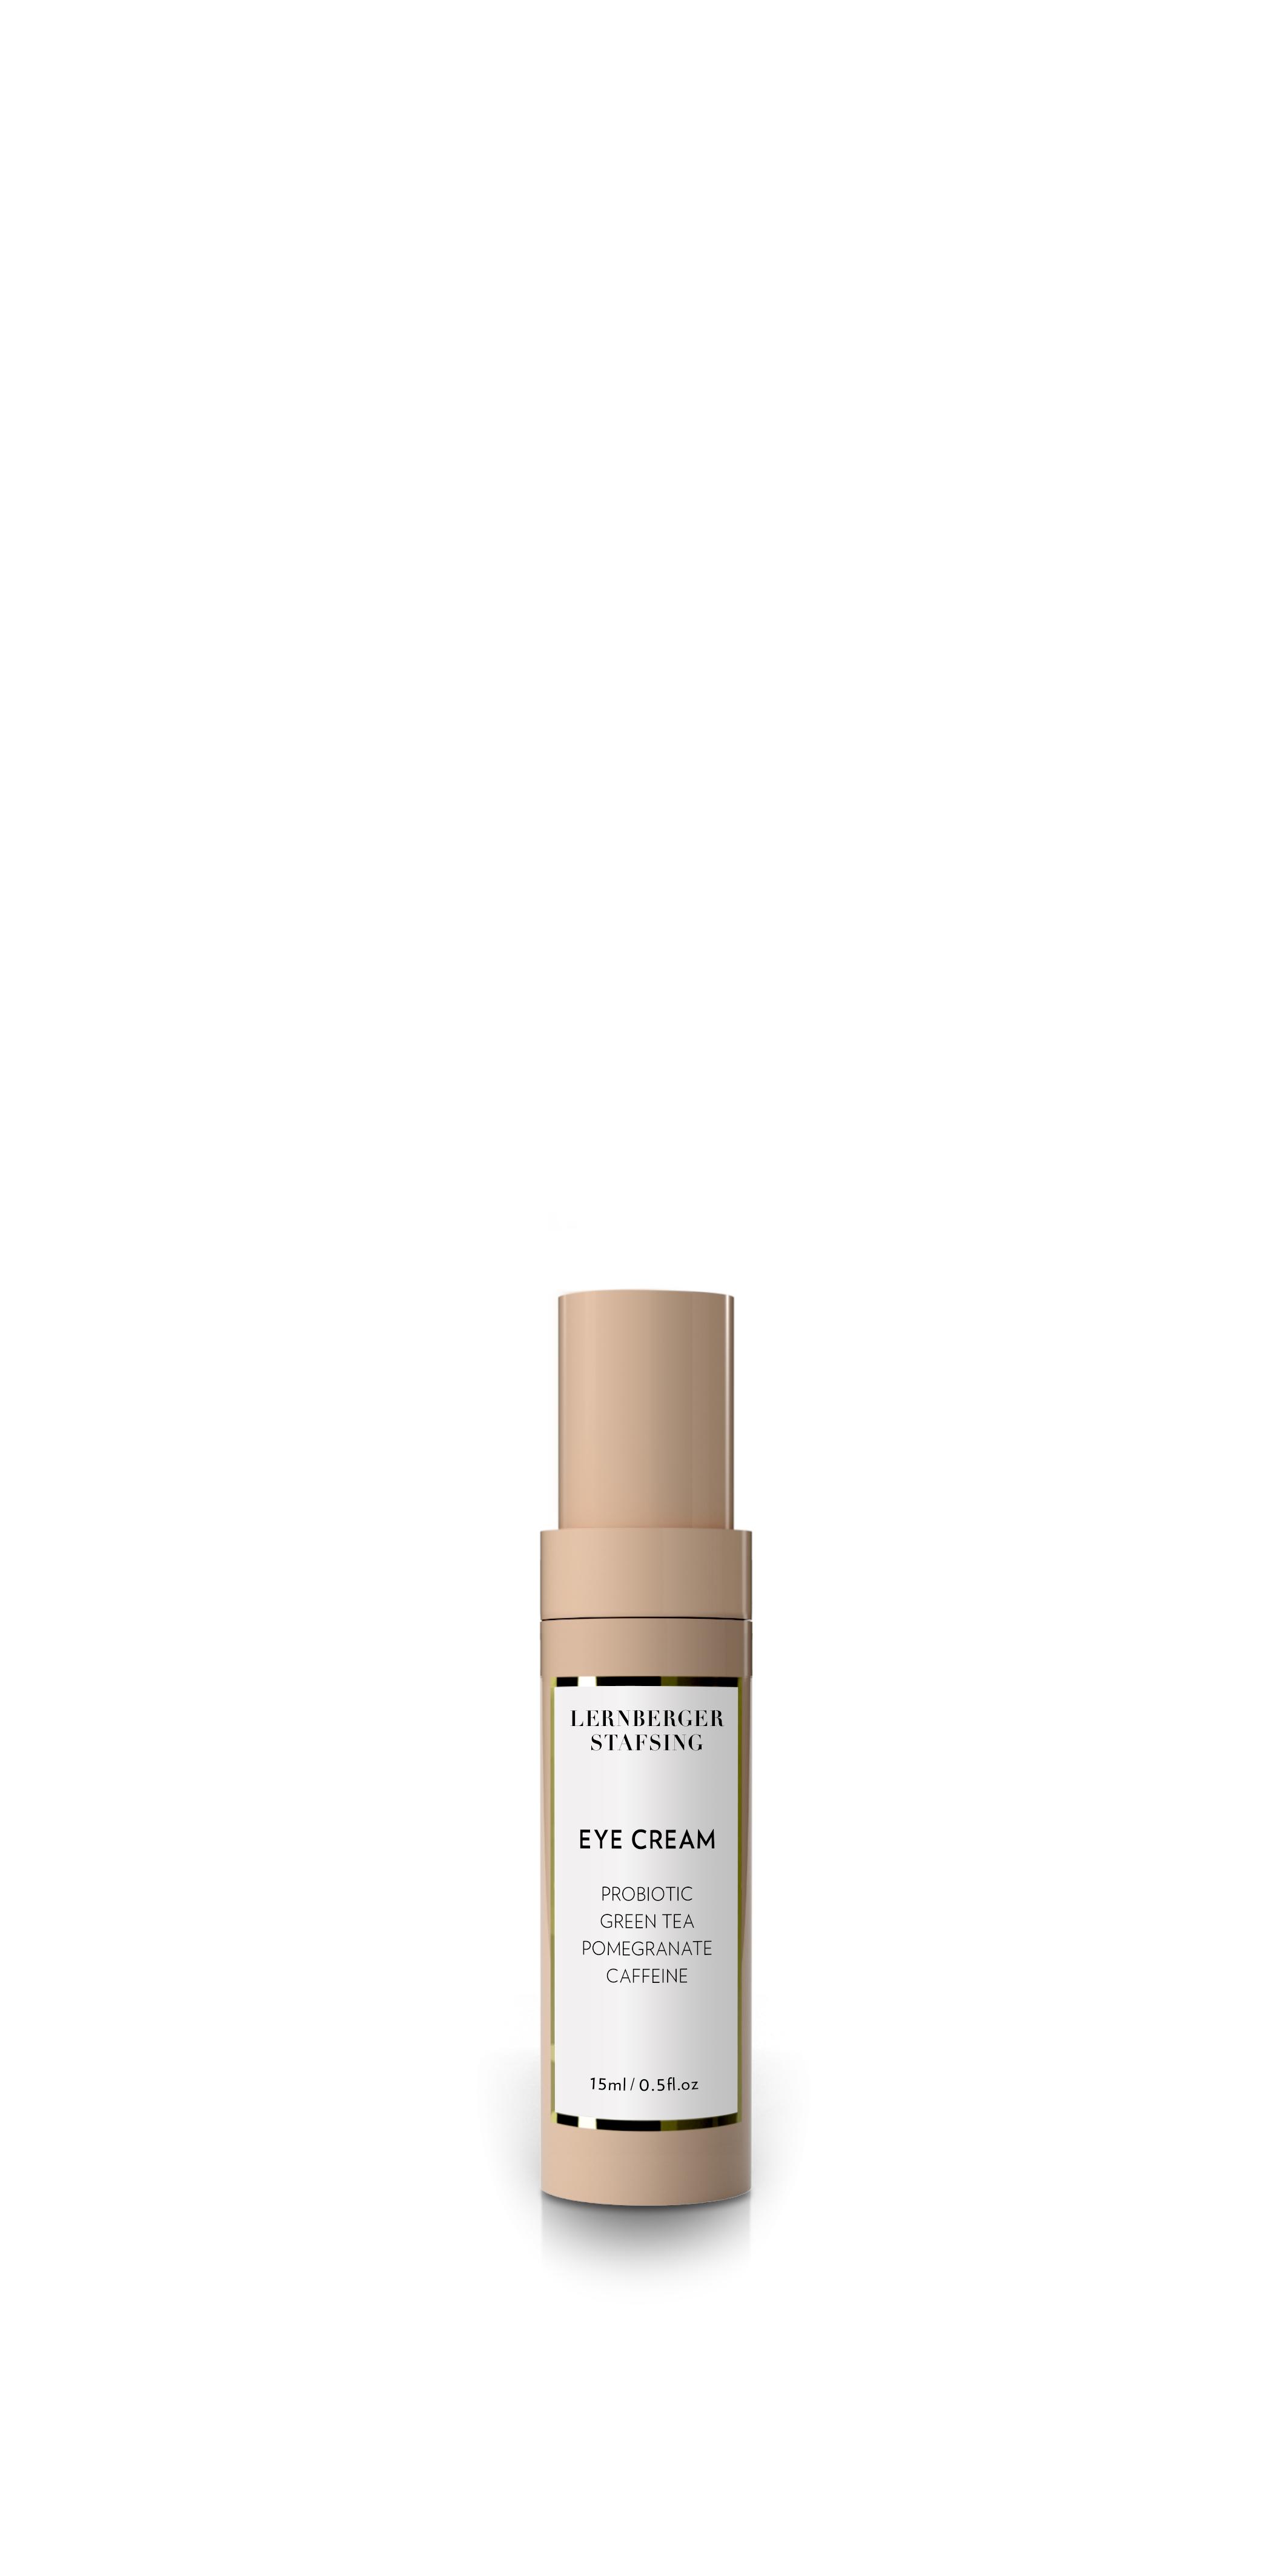 Lernberger Stafsing Eye Cream, 15 ml